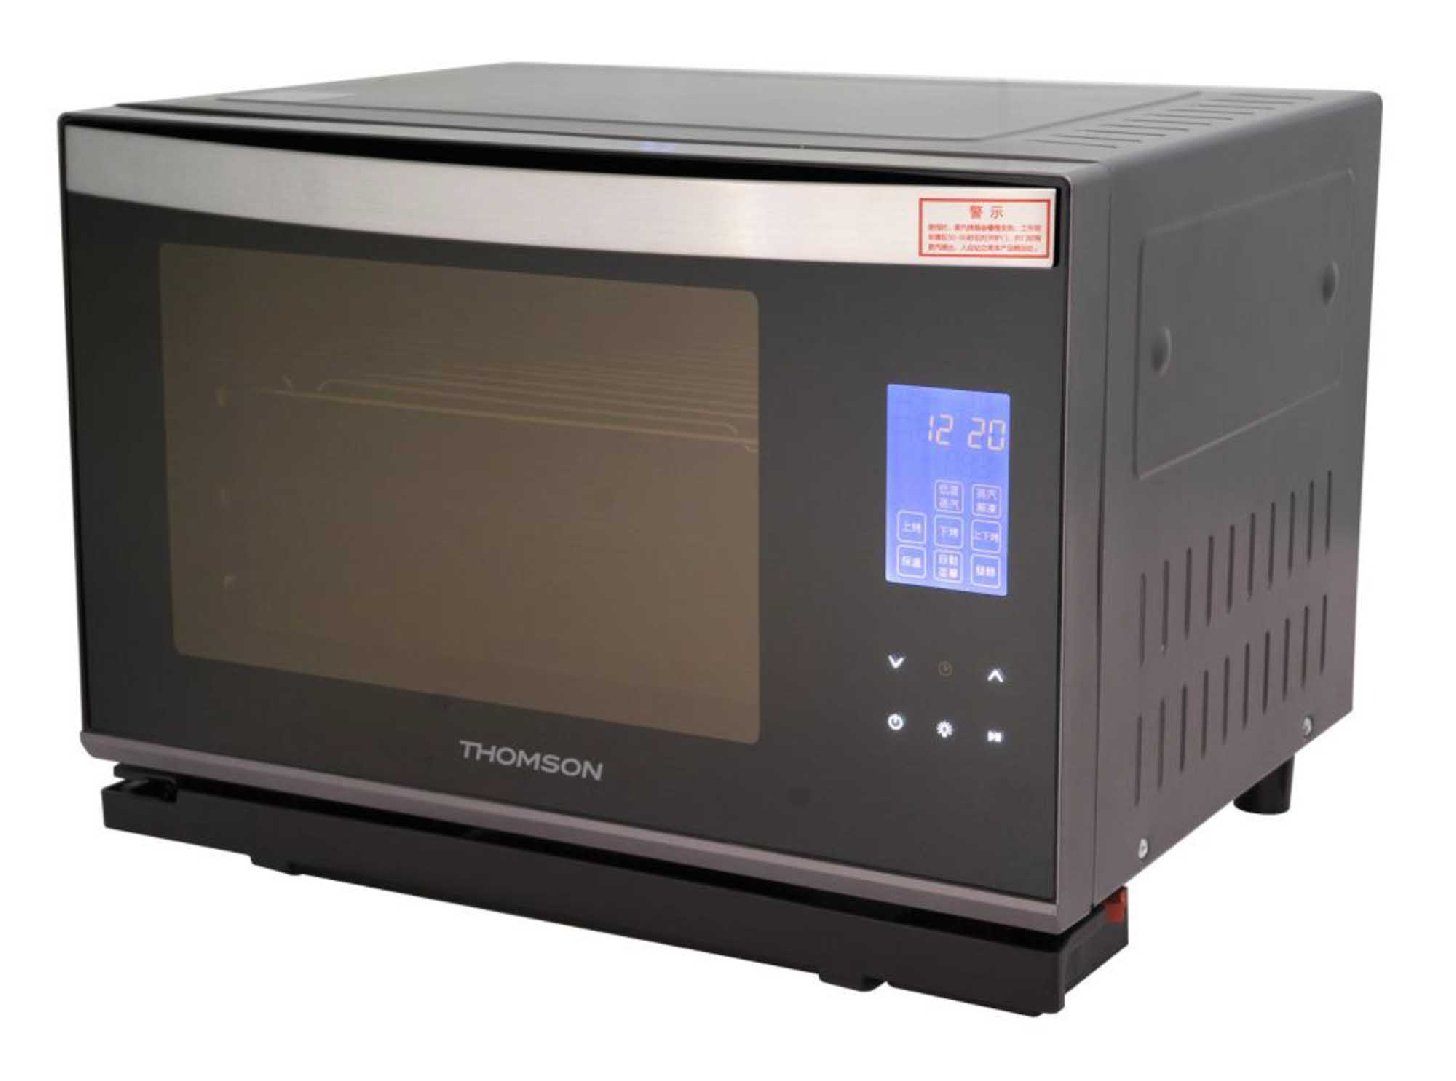 THOMSON TM-SL328 蒸氣焗爐一機兩用  蒸得又焗得